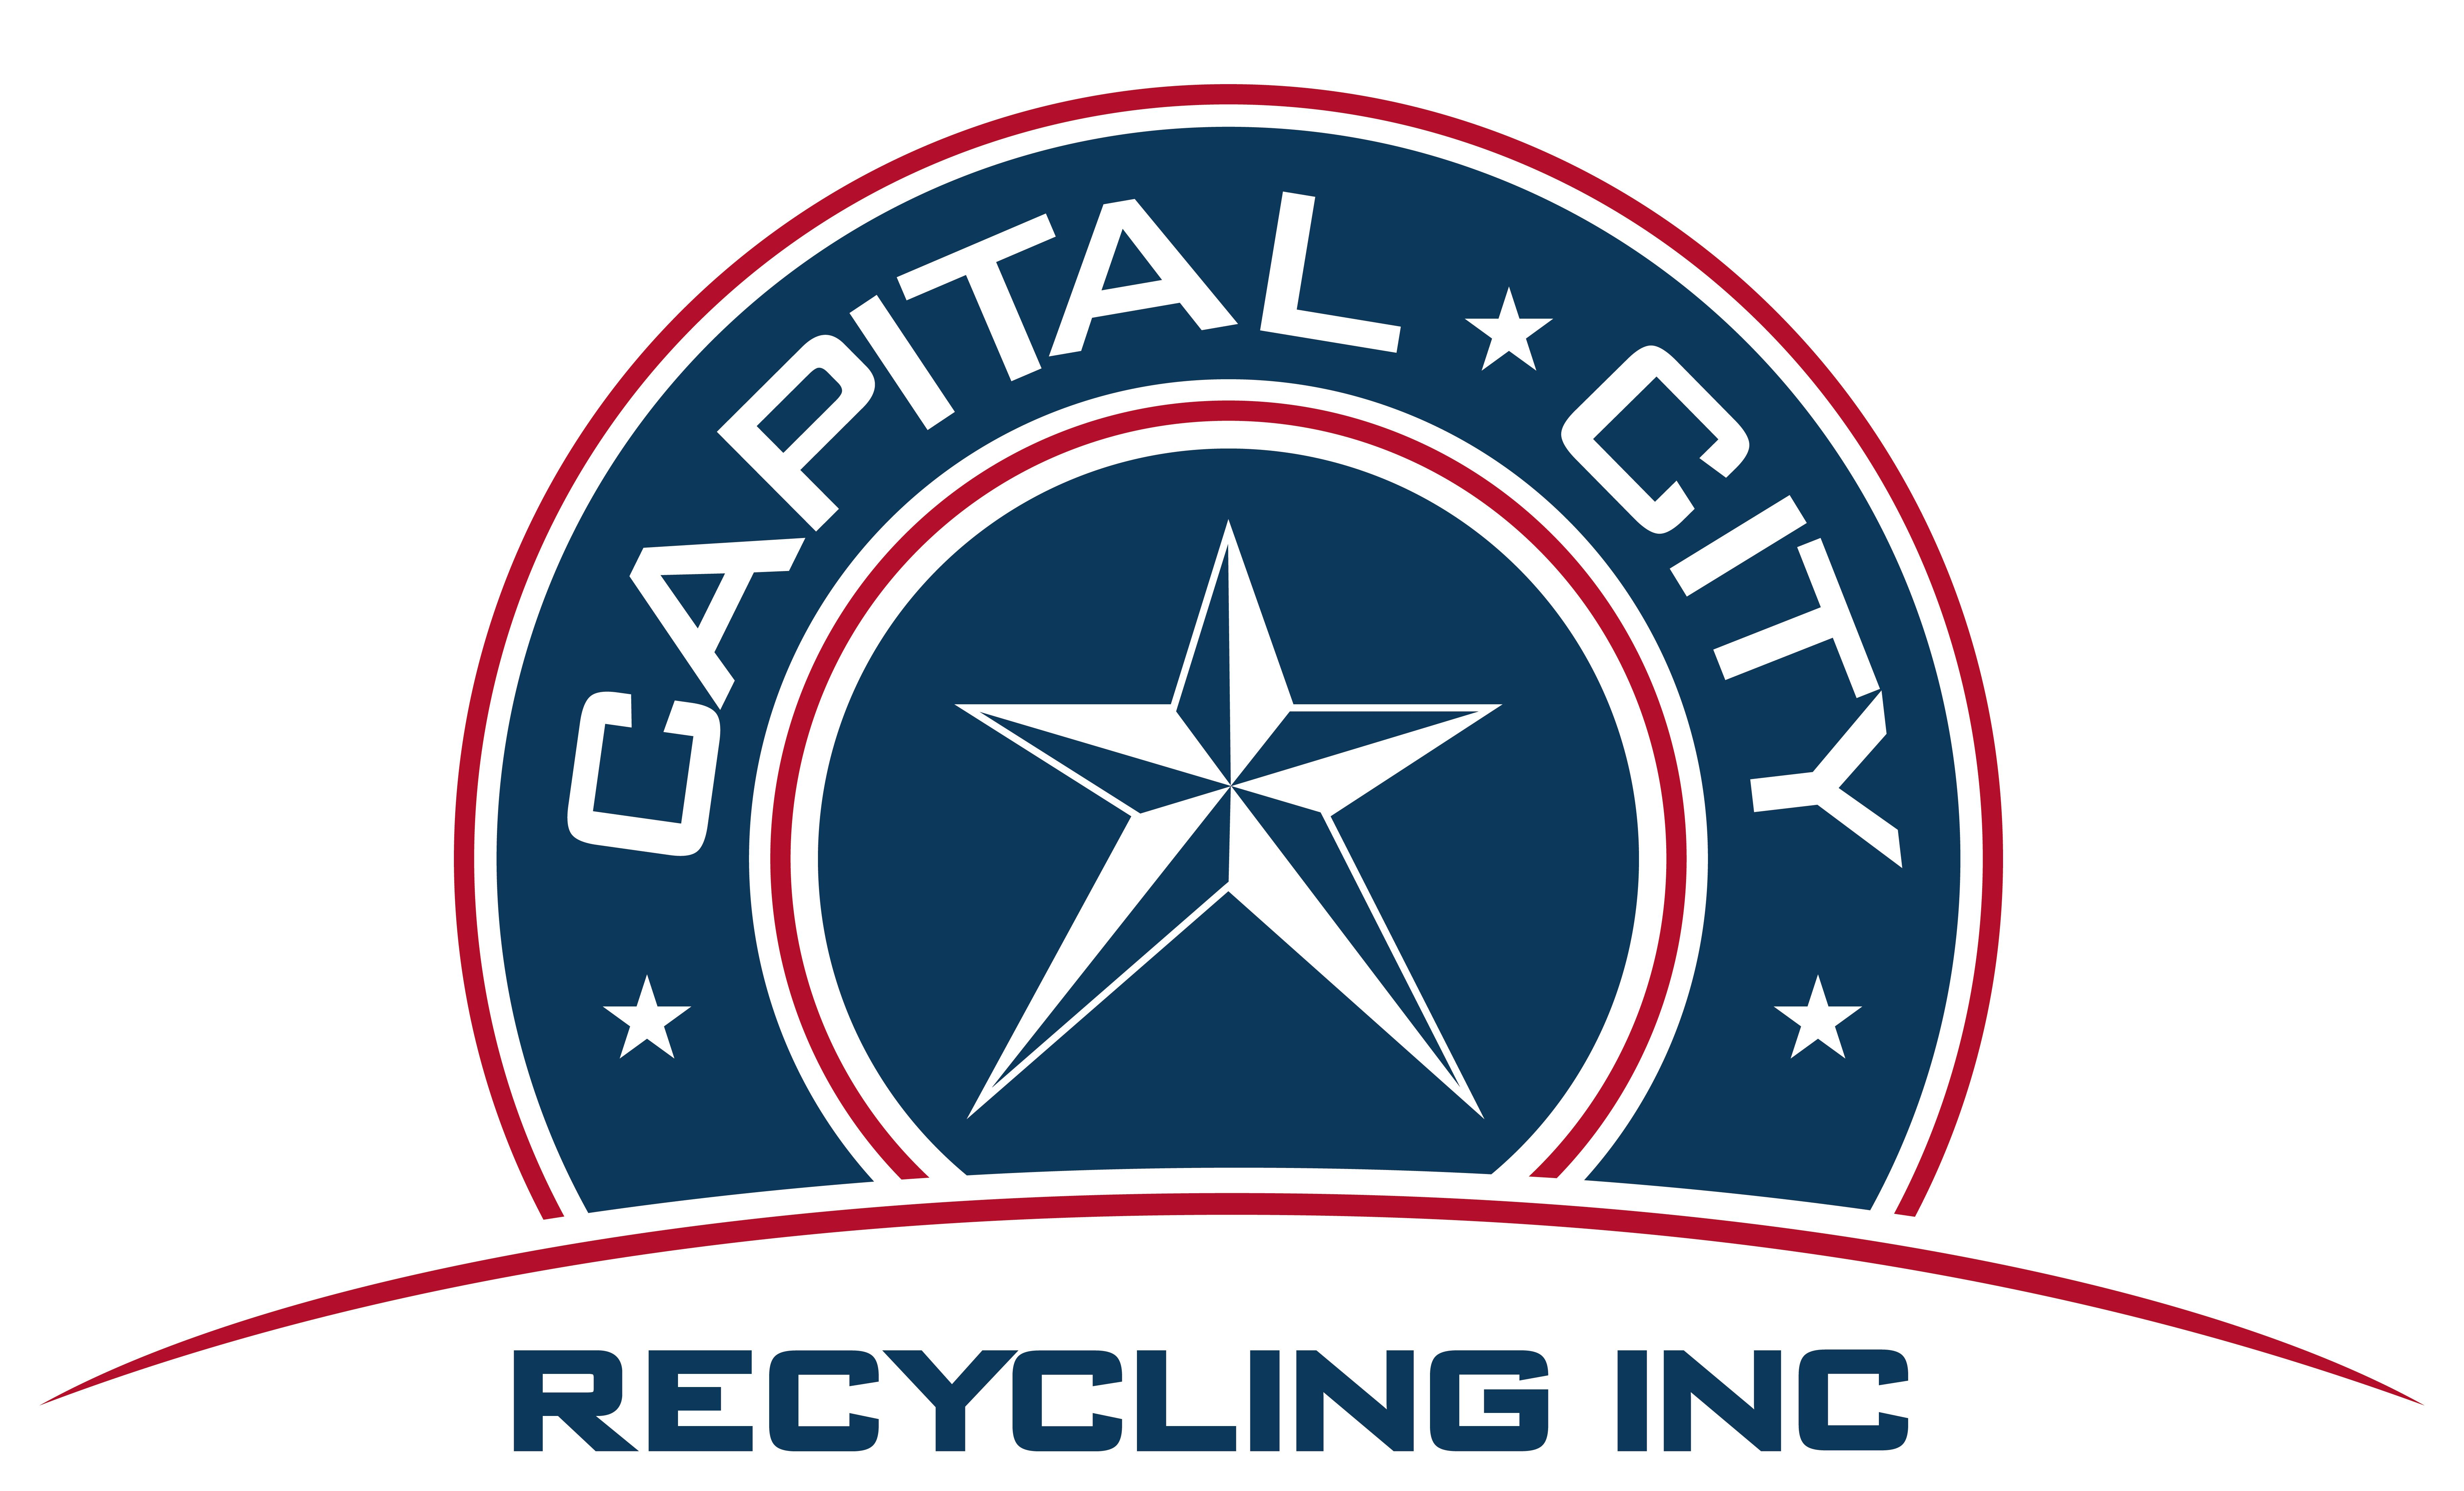 Capital City Recycling Inc. image 6